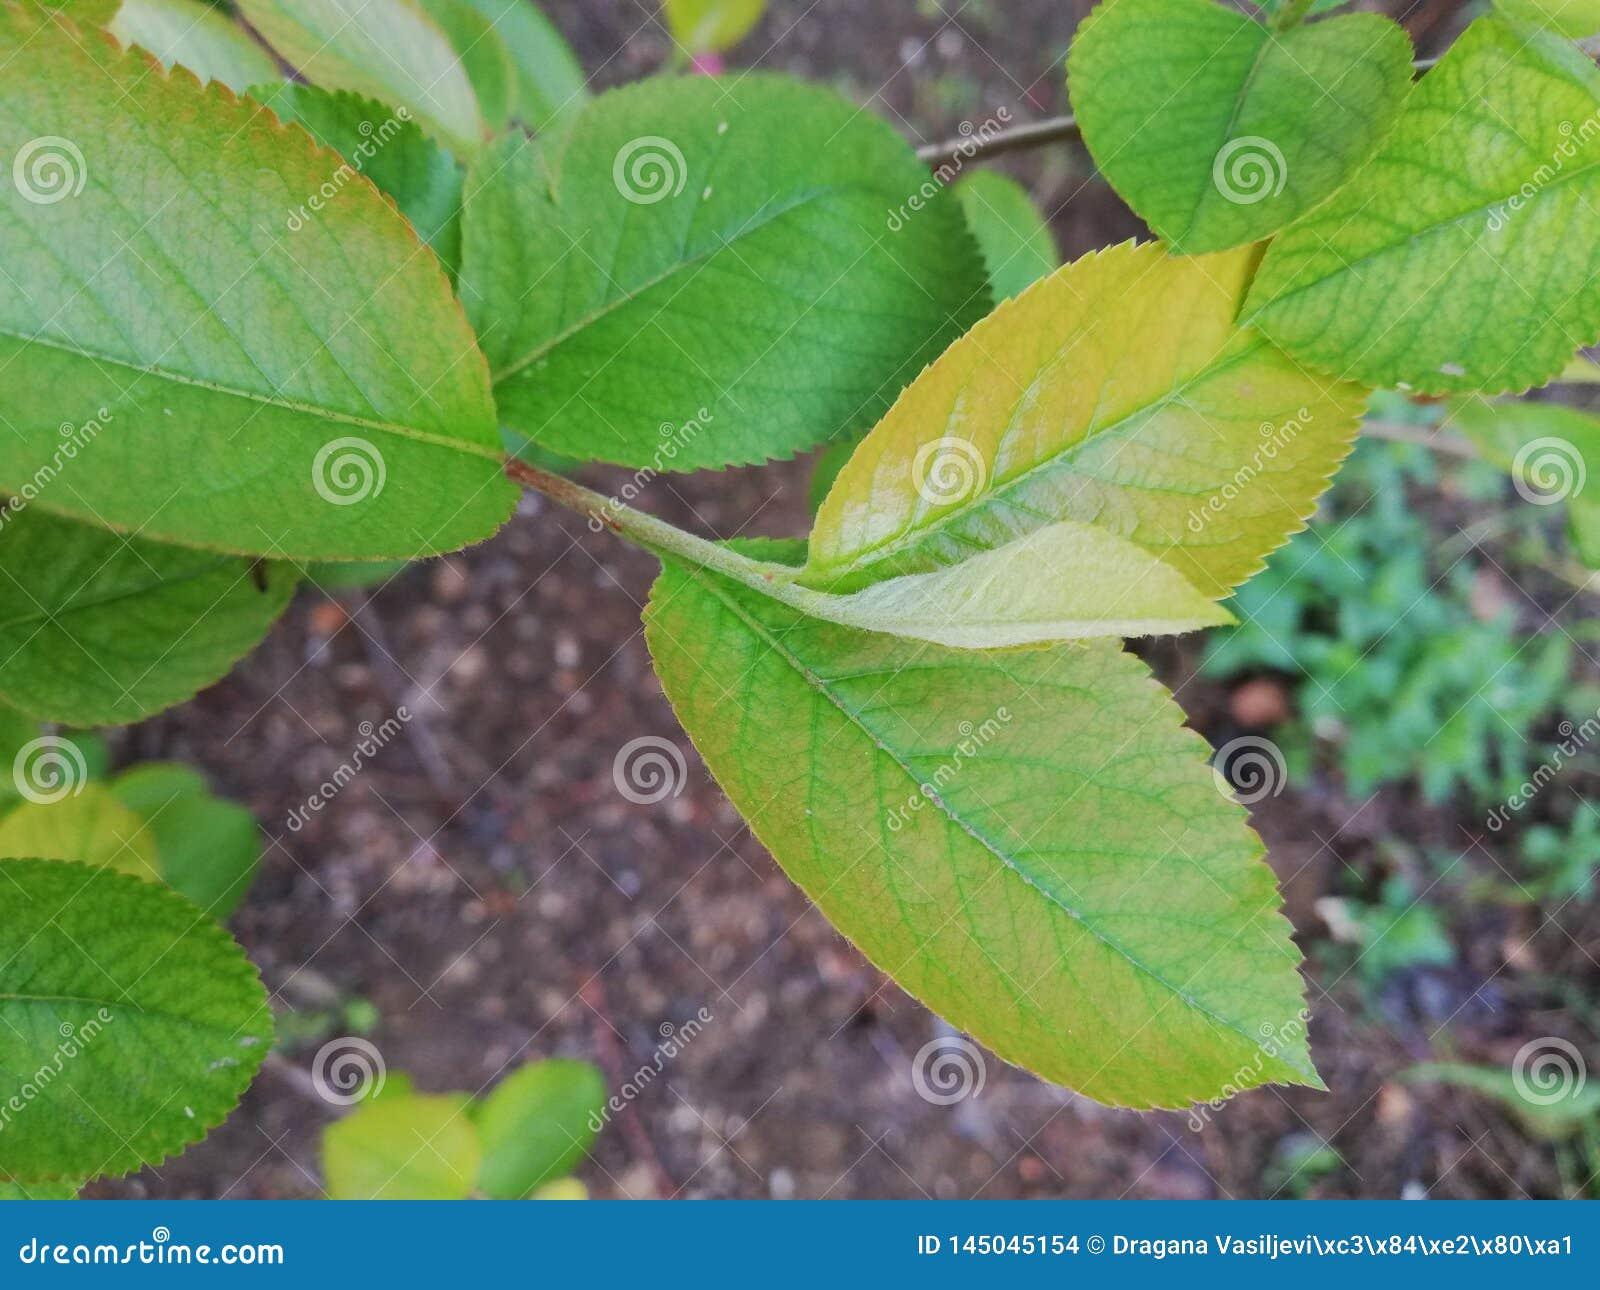 Aronia leaves